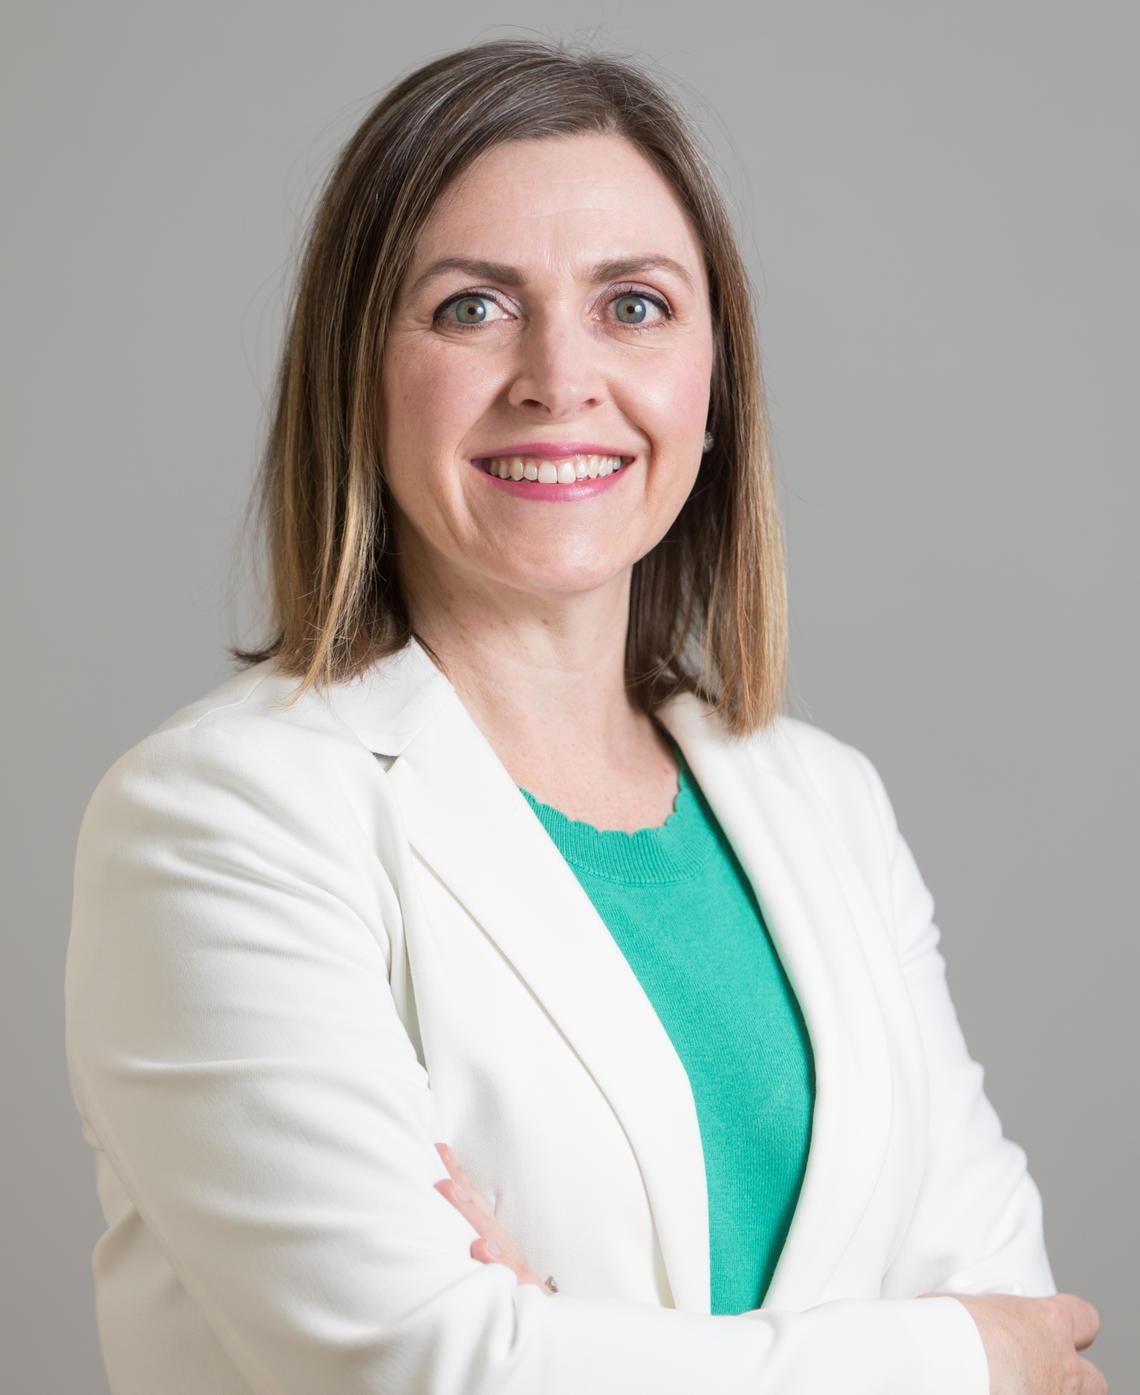 Jennifer Davies, the director of the Diagnostic Services Unit